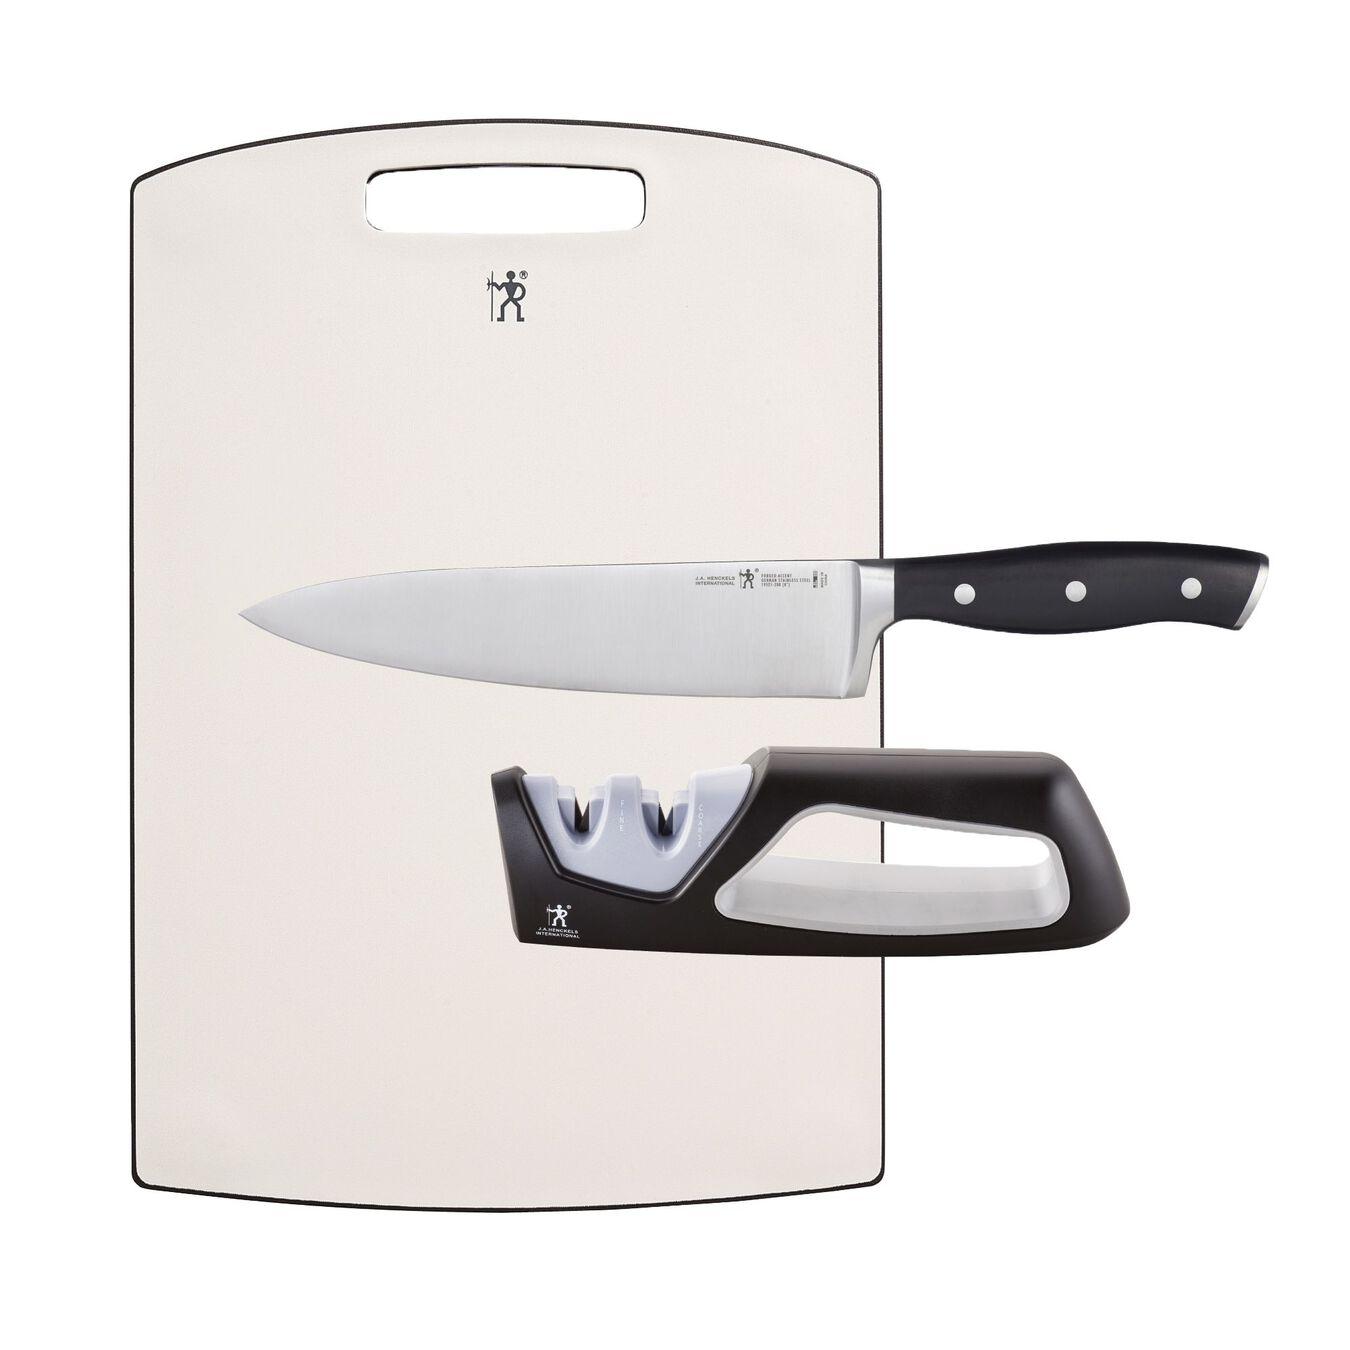 3 Piece Knife set,,large 1